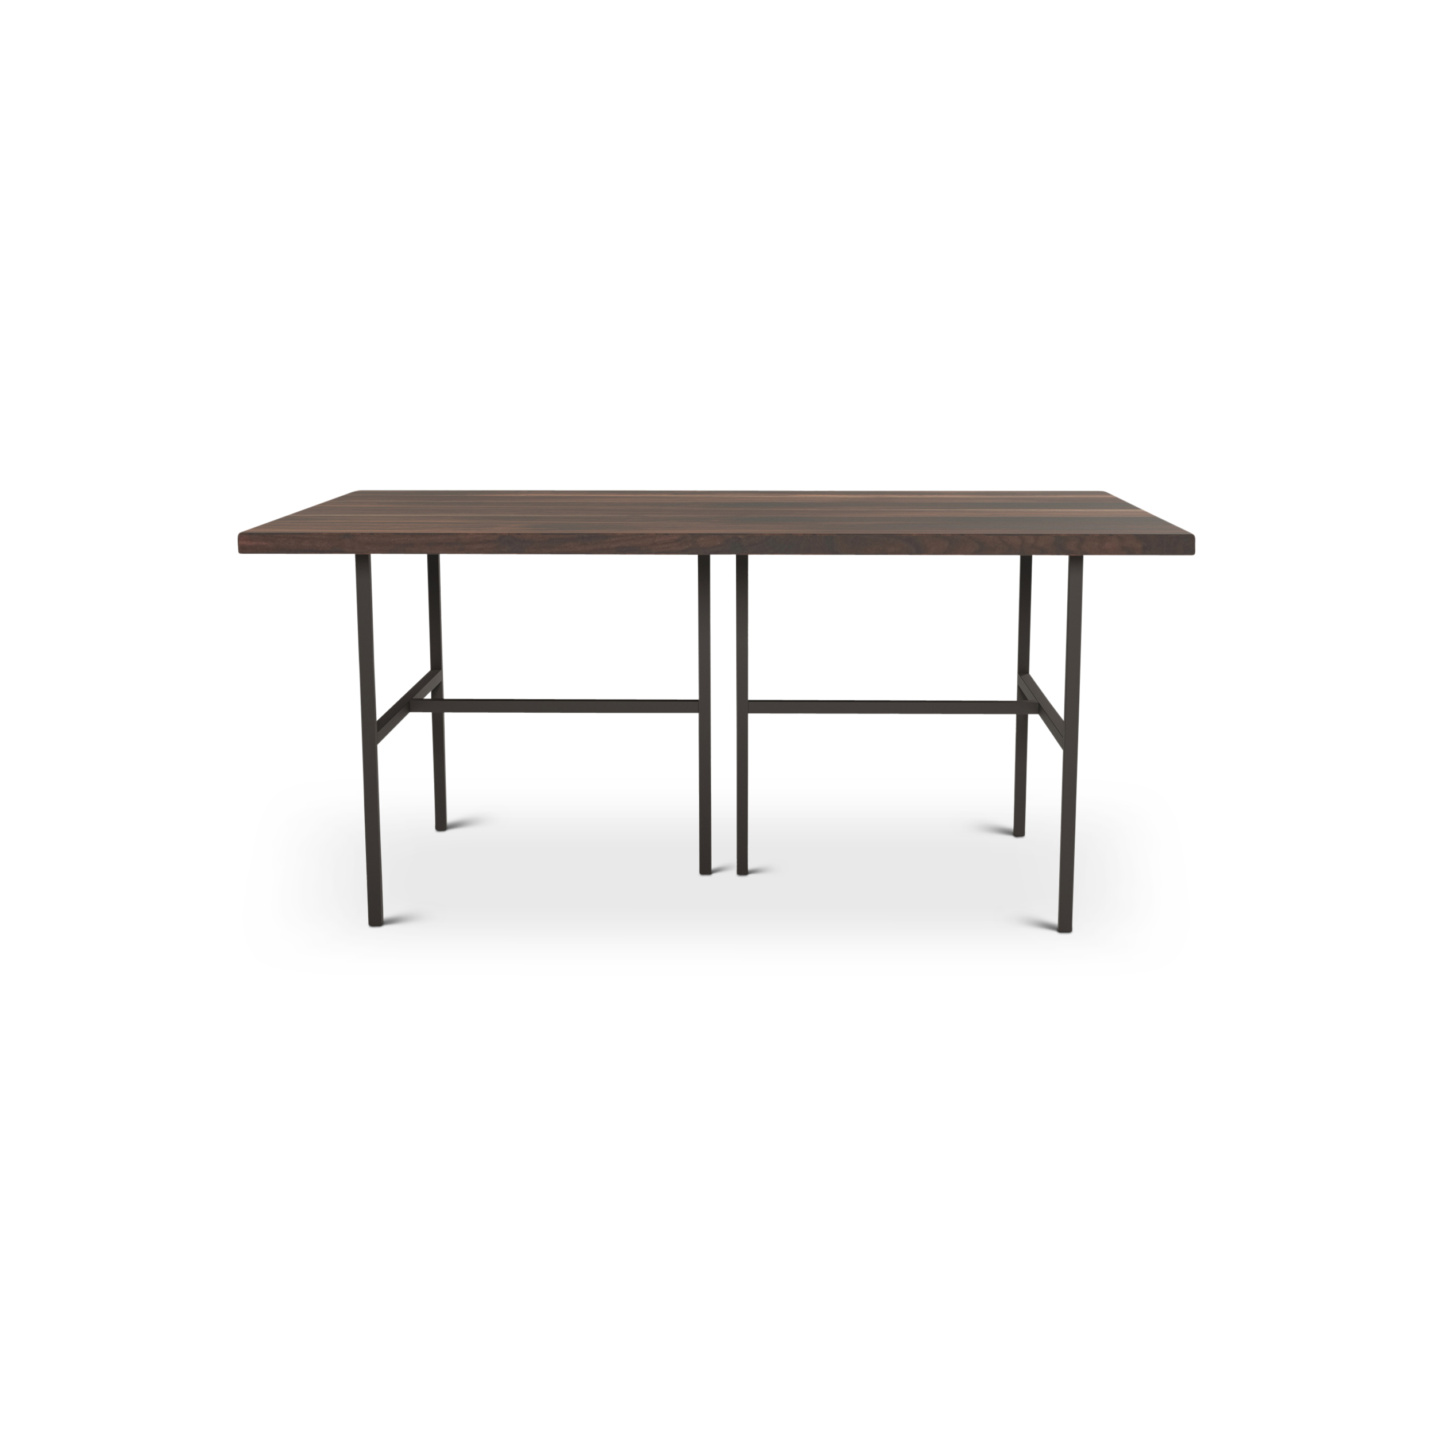 Modern solid walnut table on black metal legs